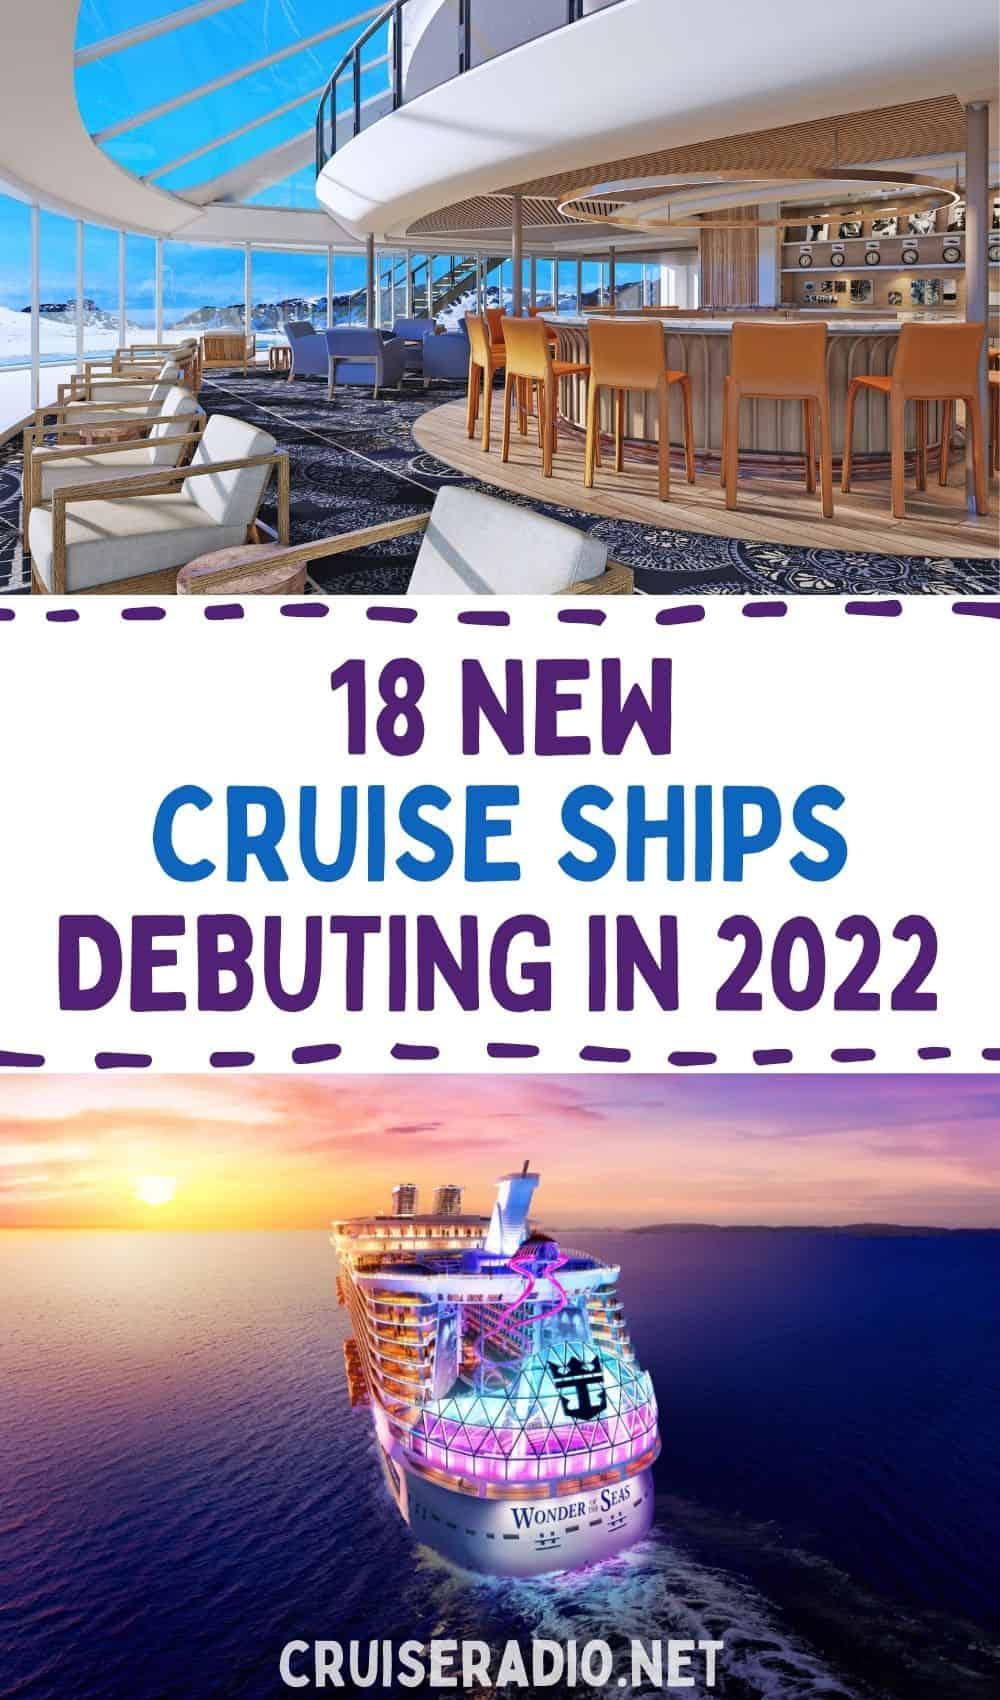 18 new cruise ships debuting in 2022